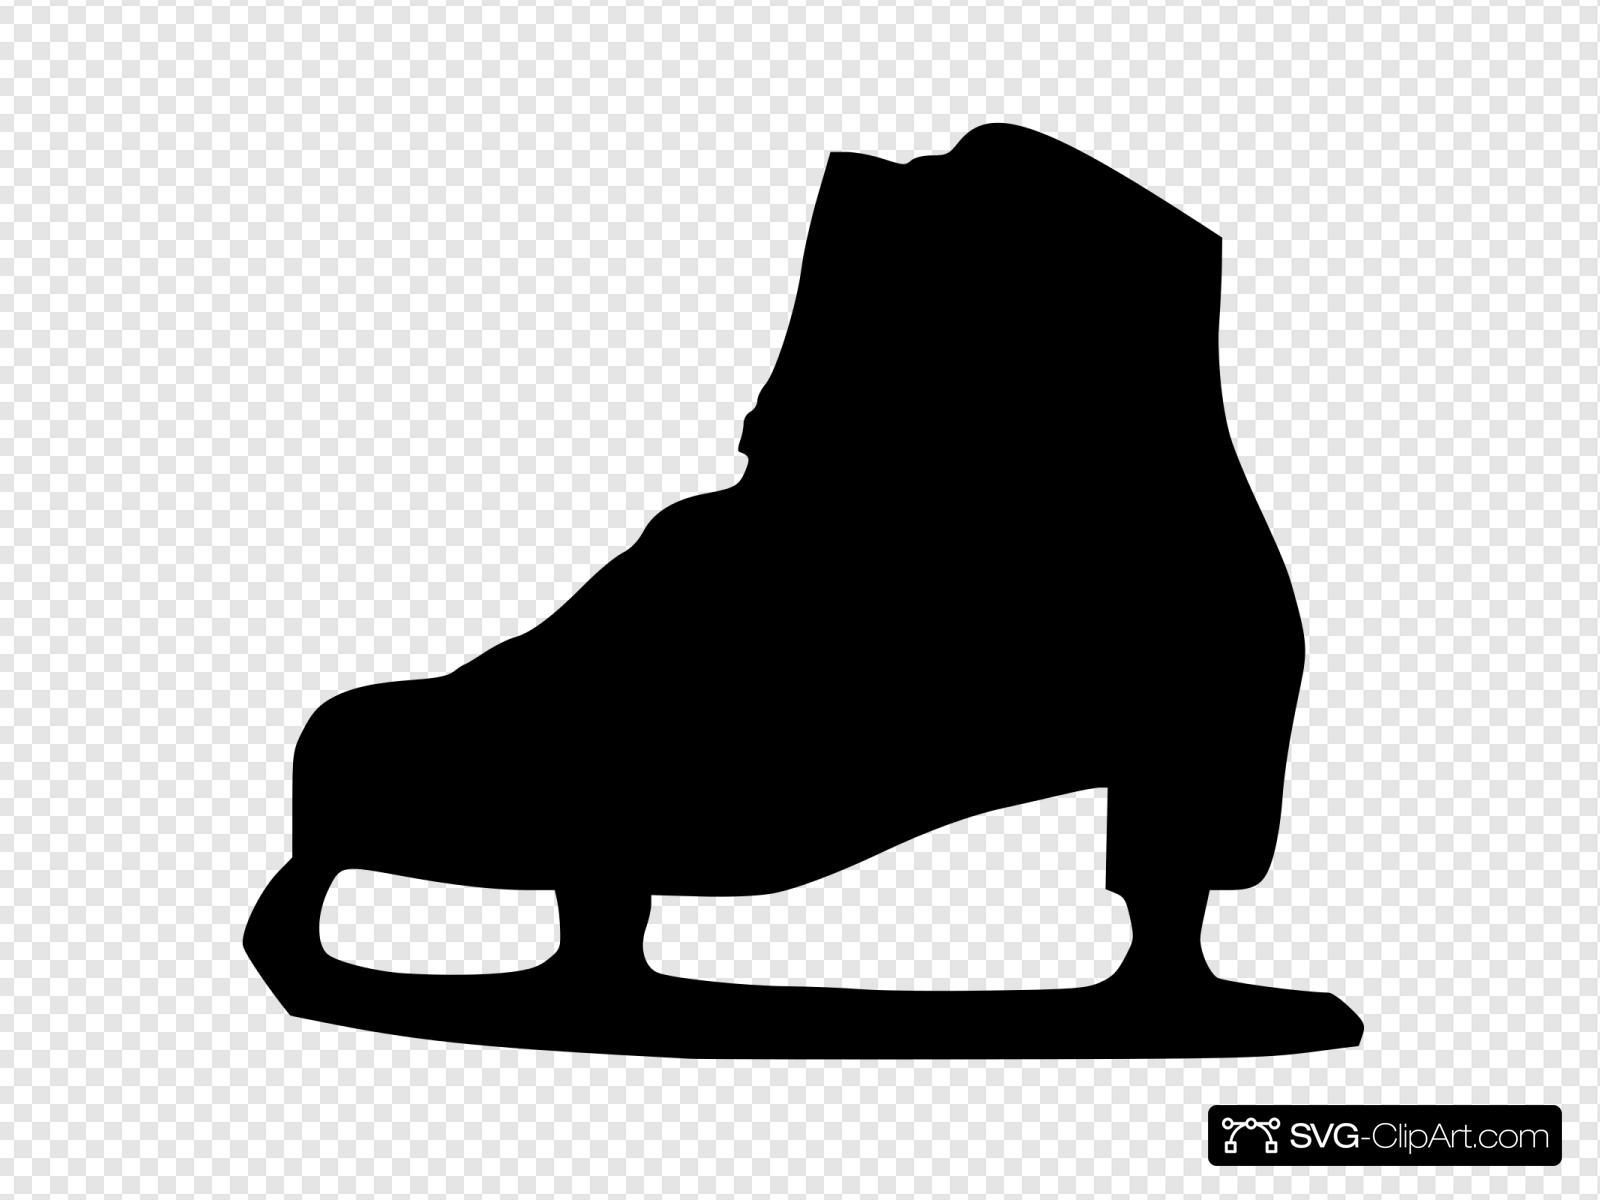 skate boots svg vector skate boots clip art svg clipart svg clipart